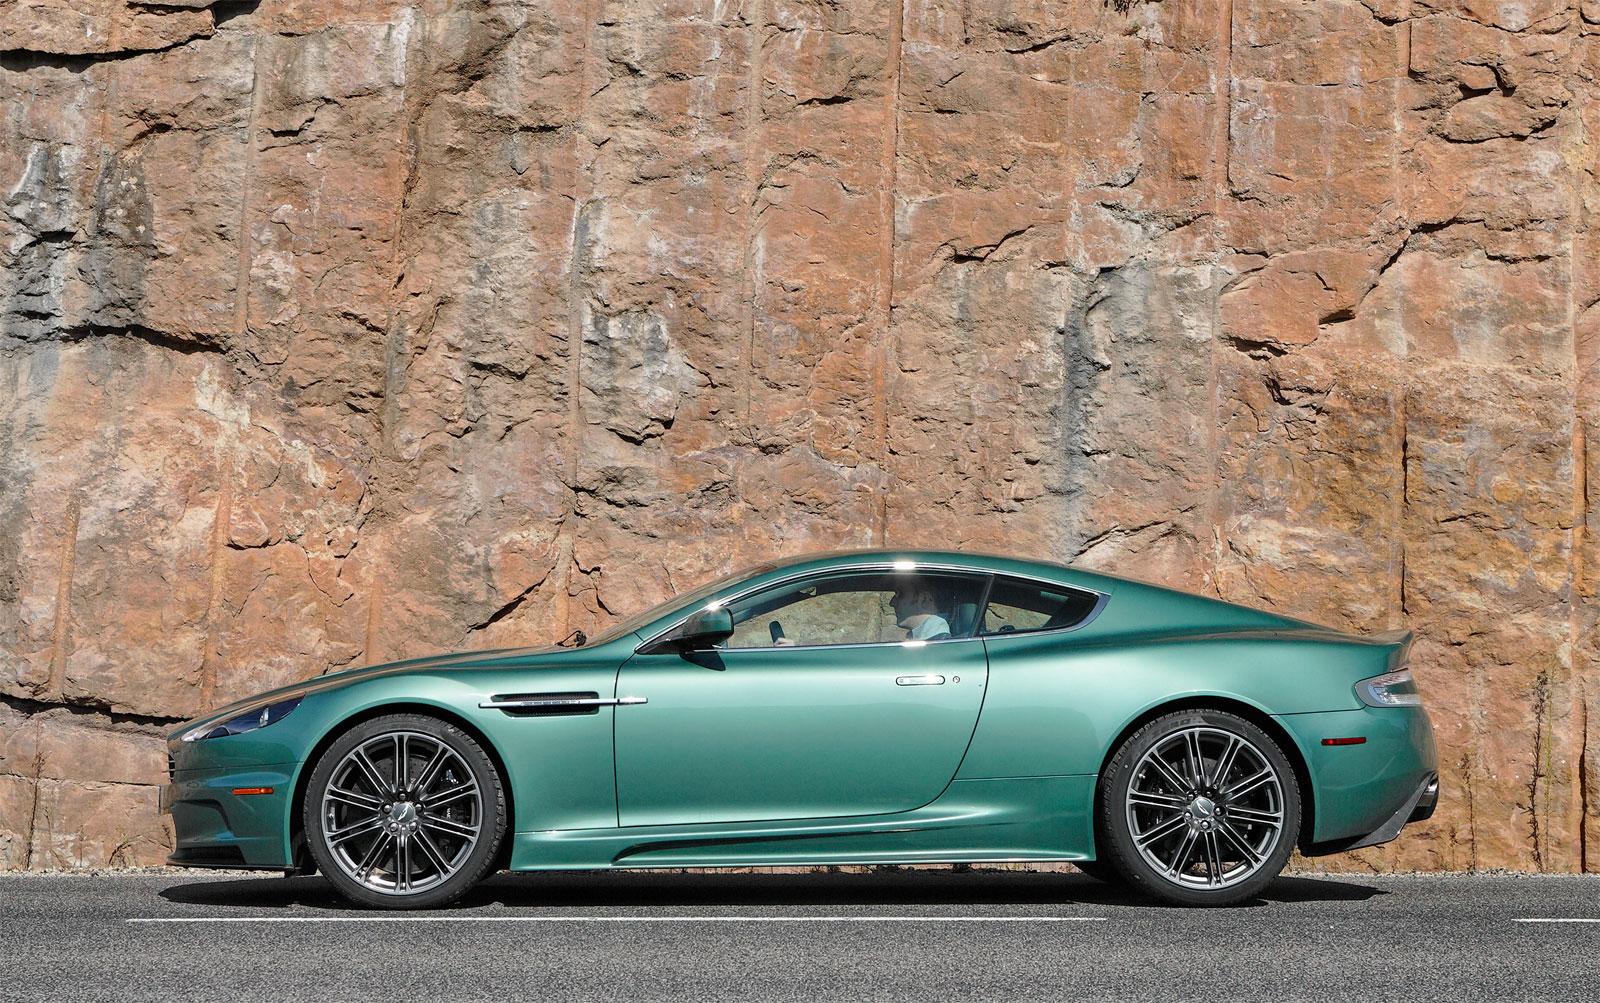 Wallpaper Mobil Sport Aston Martin: Sport Cars: Aston Martin DBS Hd Wallpapers 2010